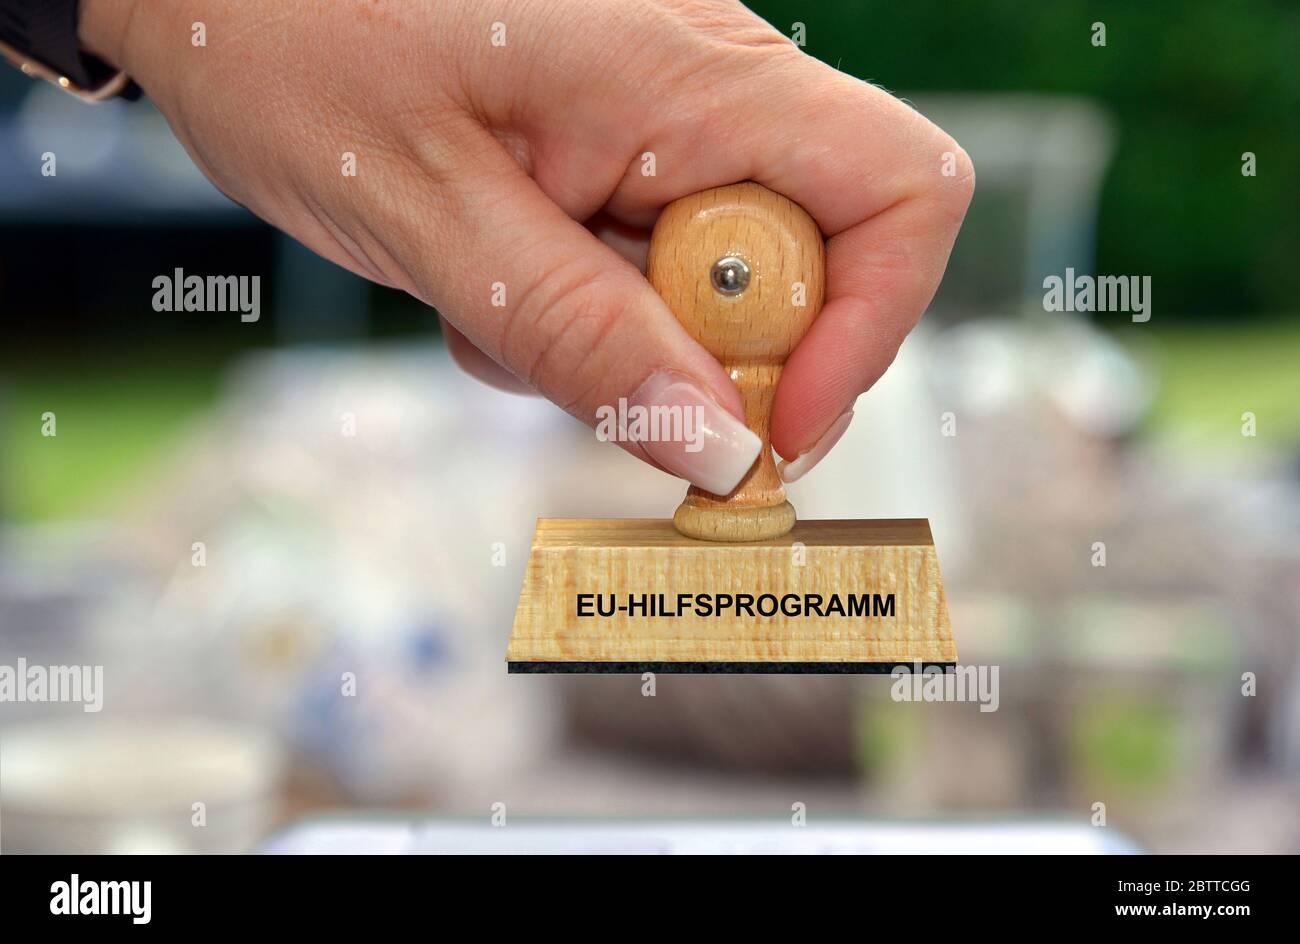 Hand mit Stempel, Frauenhand, Aufschrift: EU-Hilfsprogramm, Foto Stock